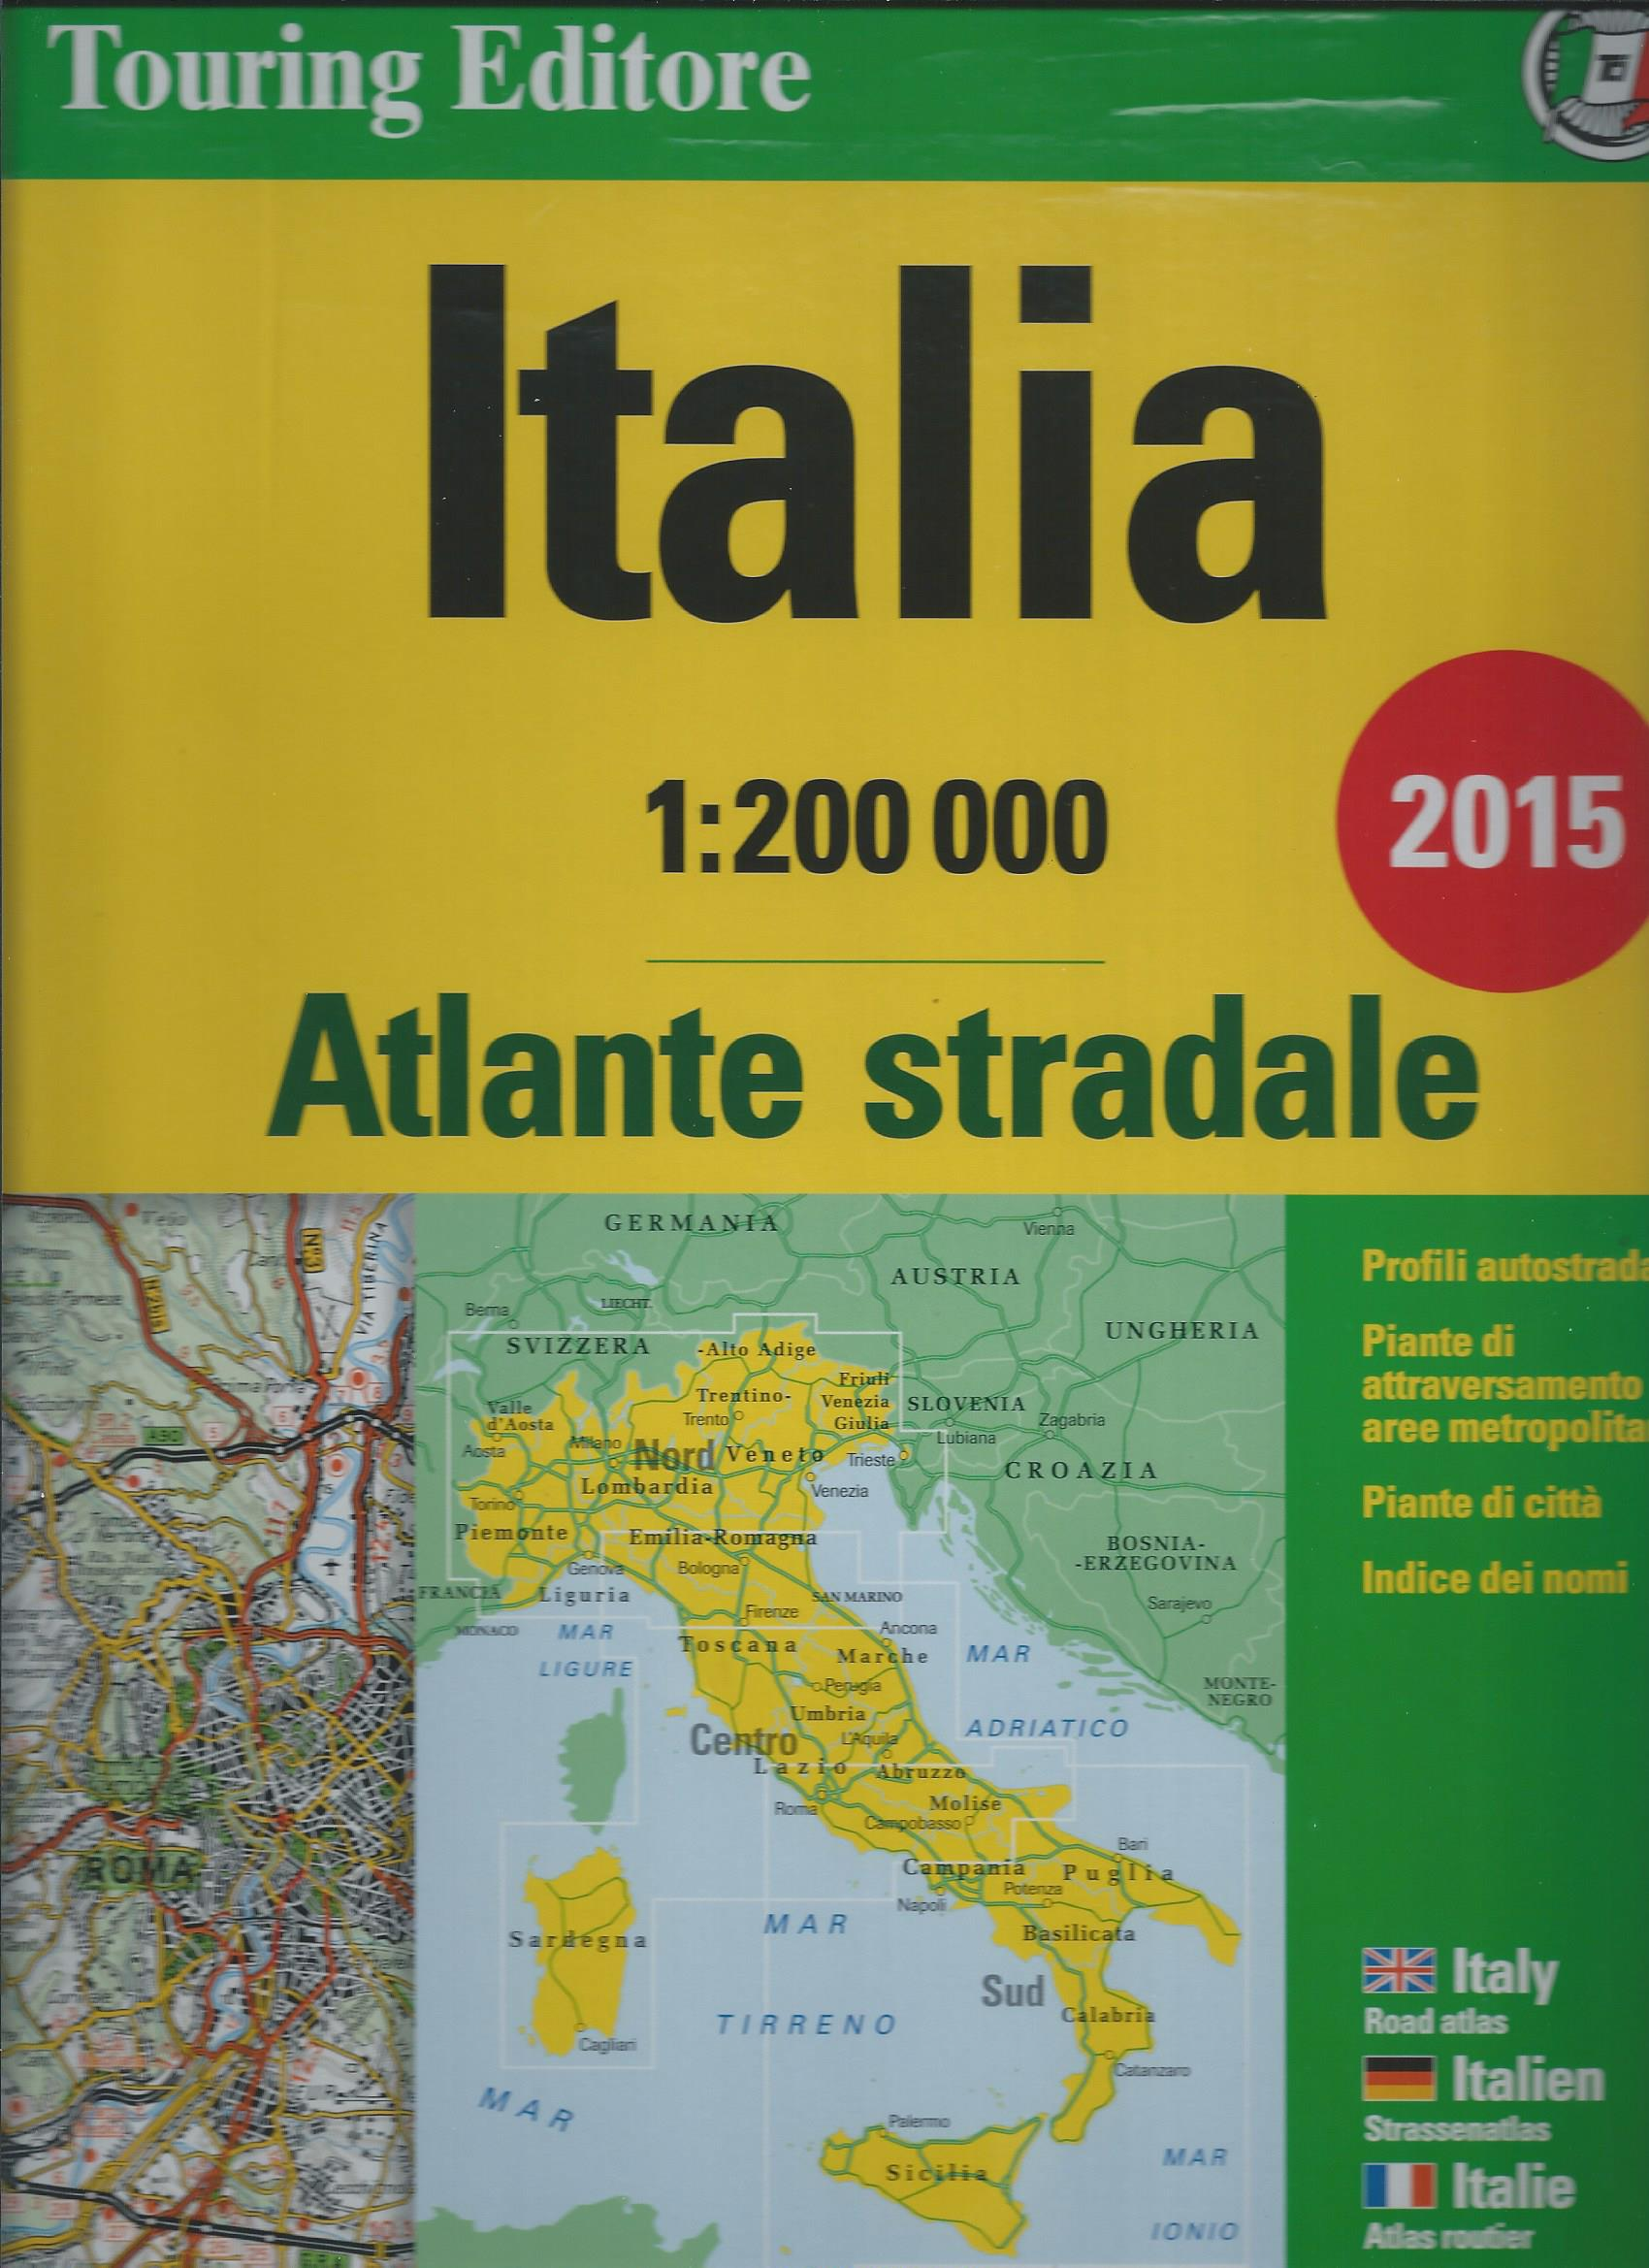 Atlante stradale Italia 1:200 000